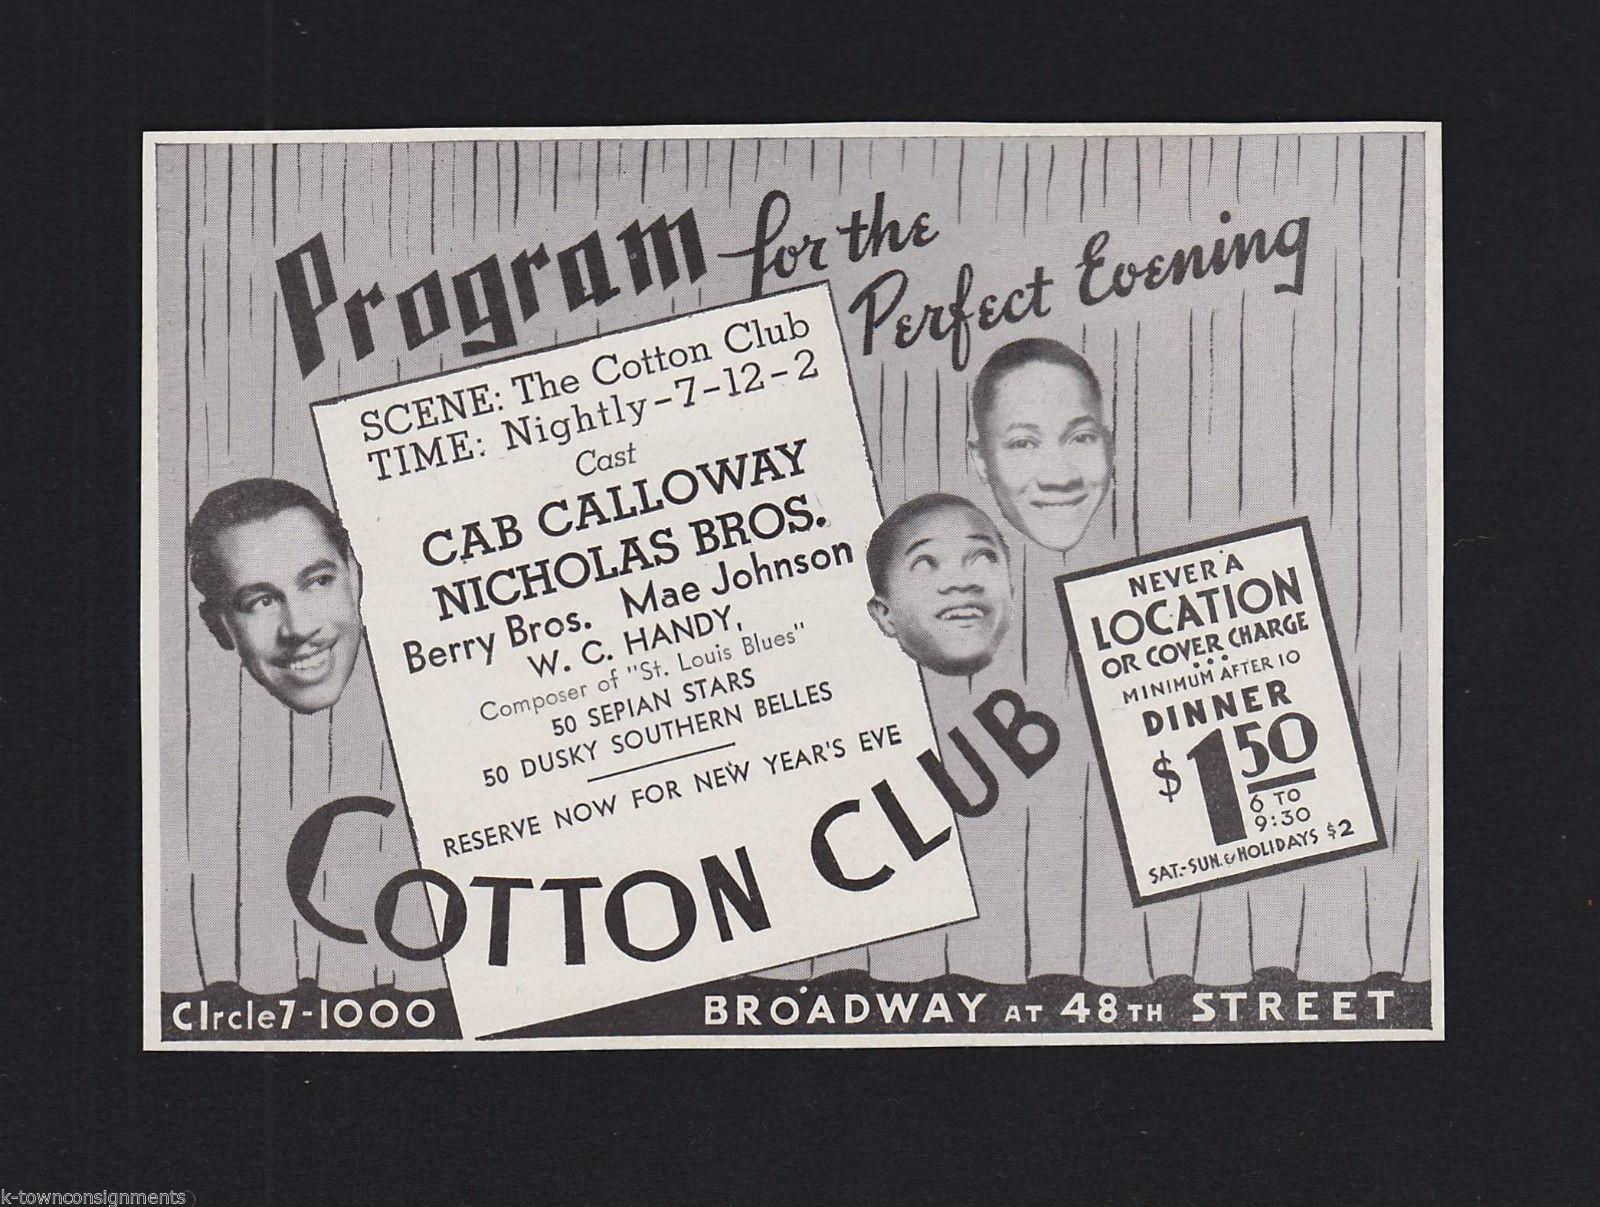 COTTON CLUB 2